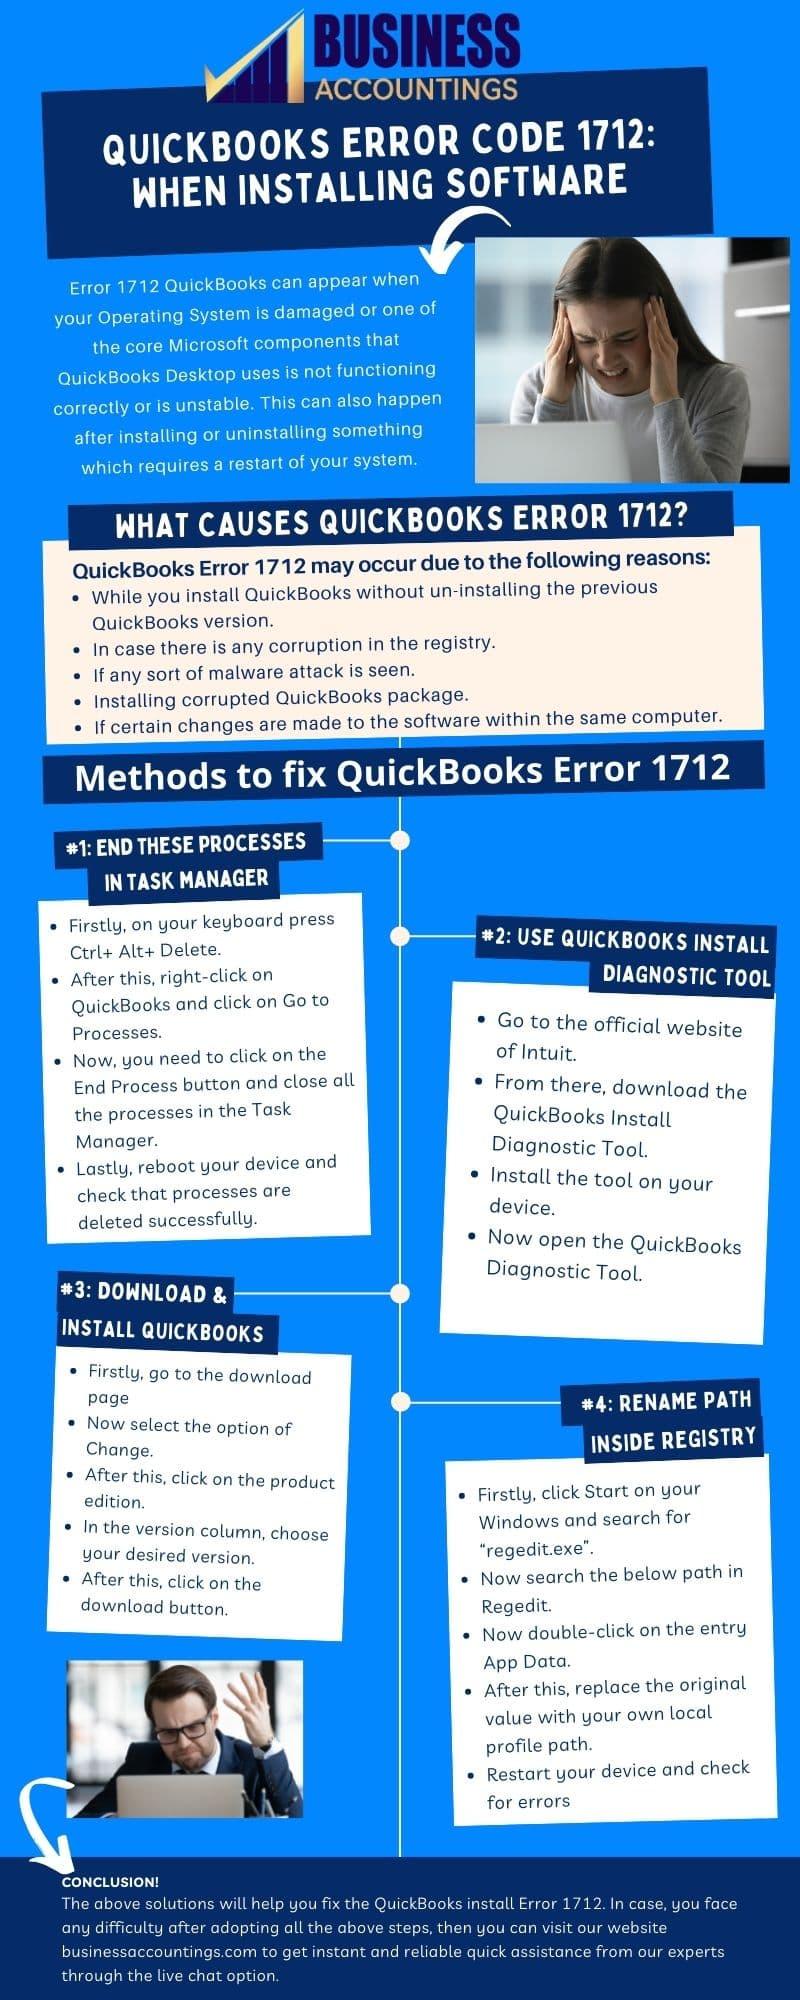 Infographic of Solutions for QuickBooks Error 1712